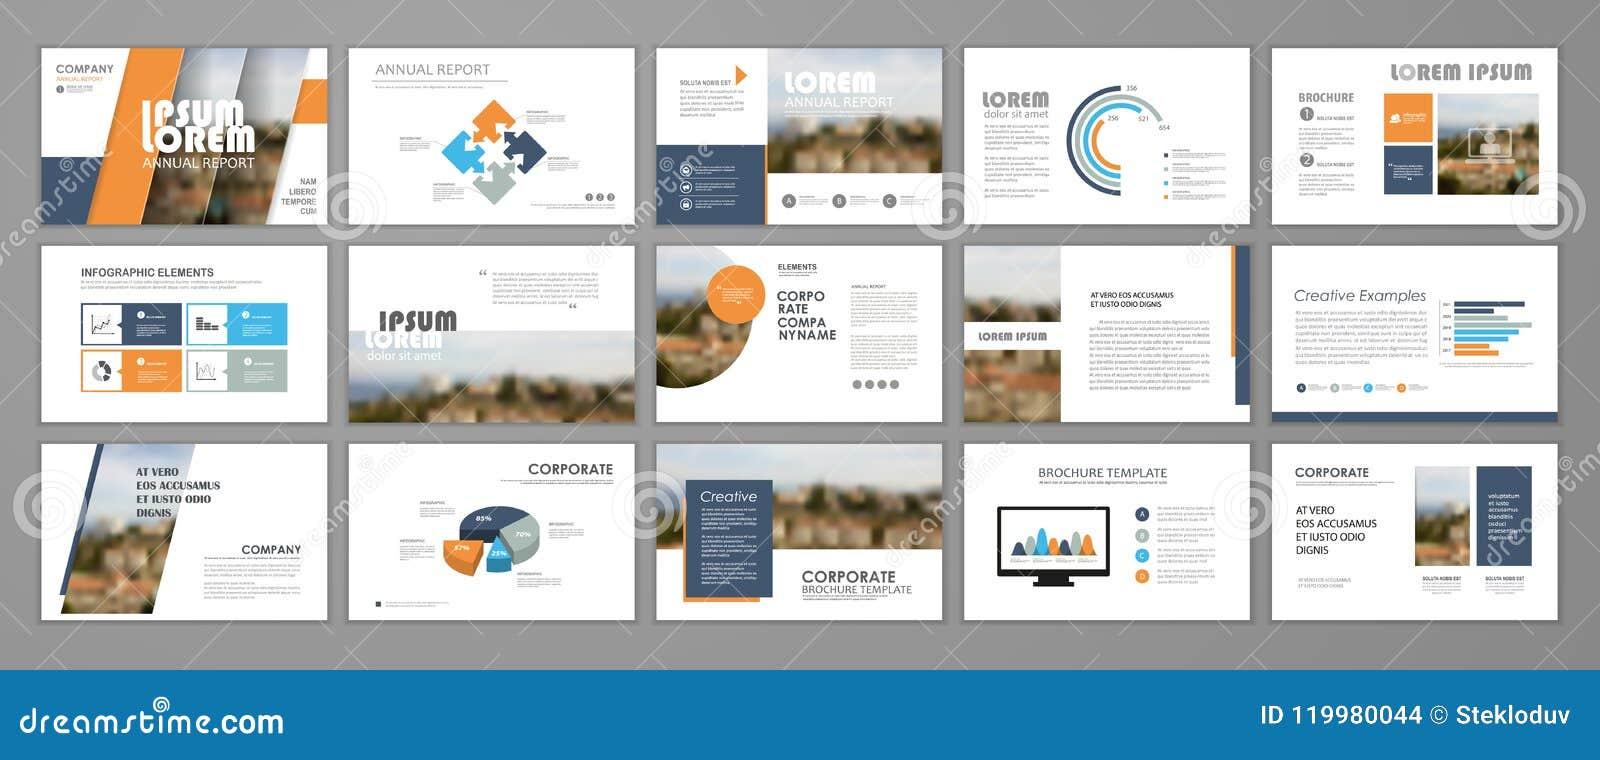 corporate slideshow templates stock vector illustration of diagram